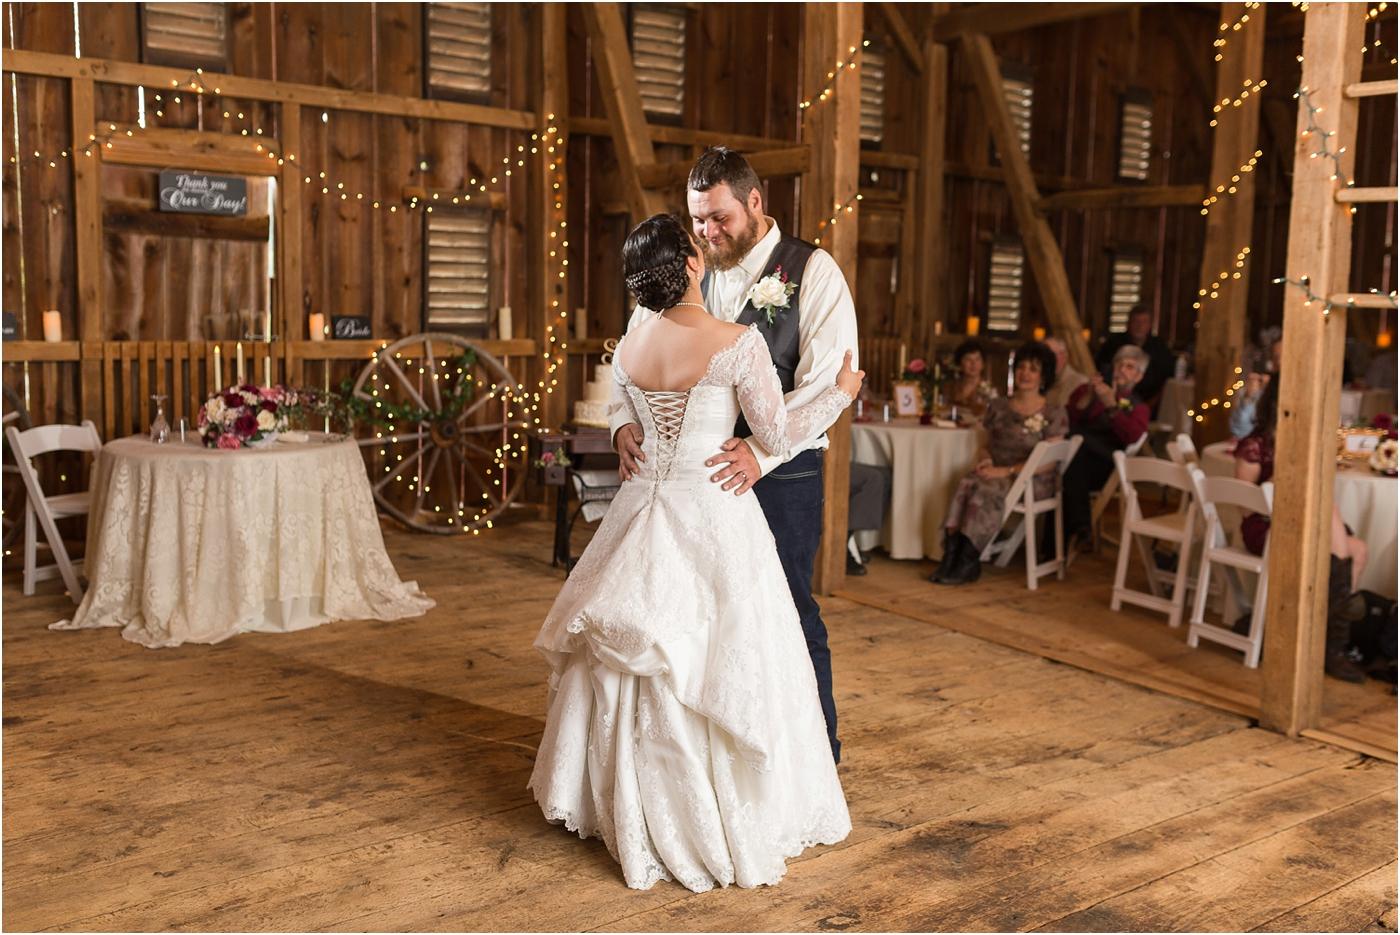 Maryland-Barn-Wedding-Photos-61.jpg